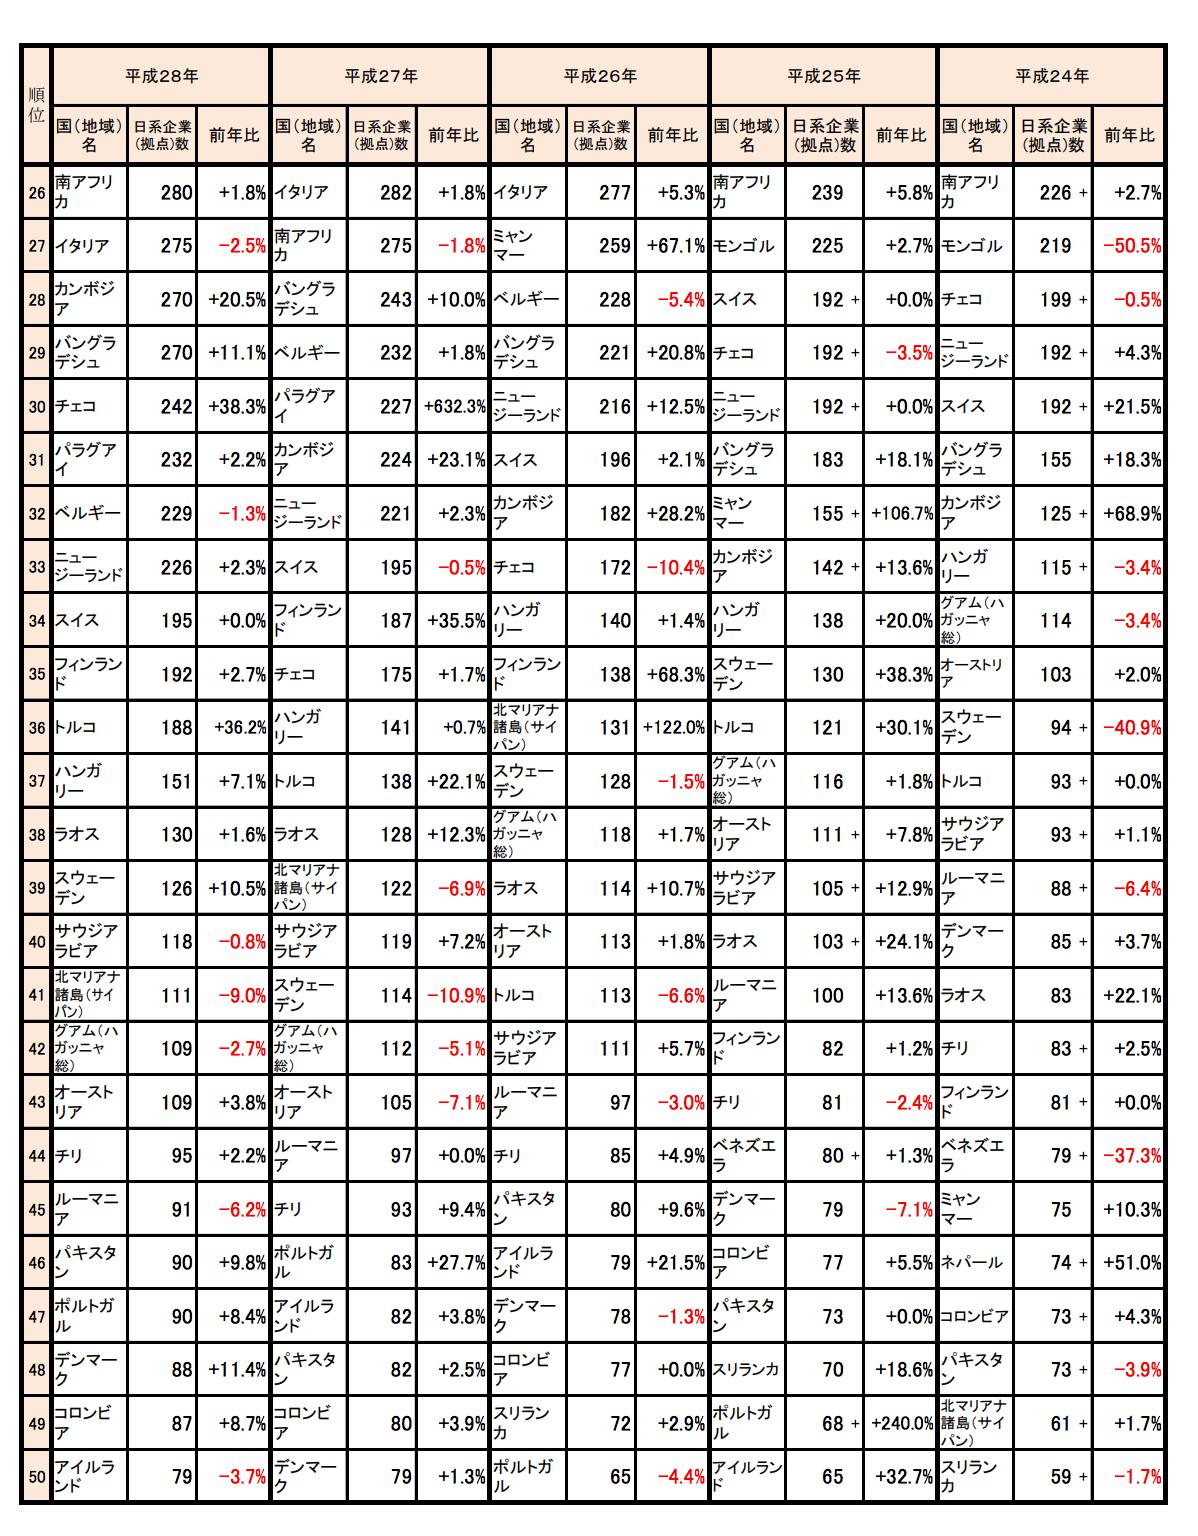 日系企業の拠点数_05